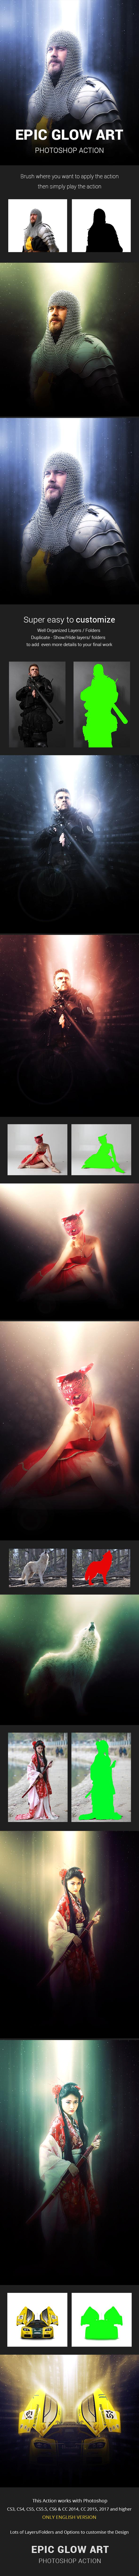 GraphicRiver Epic Glow Art Photoshop Action 20770985